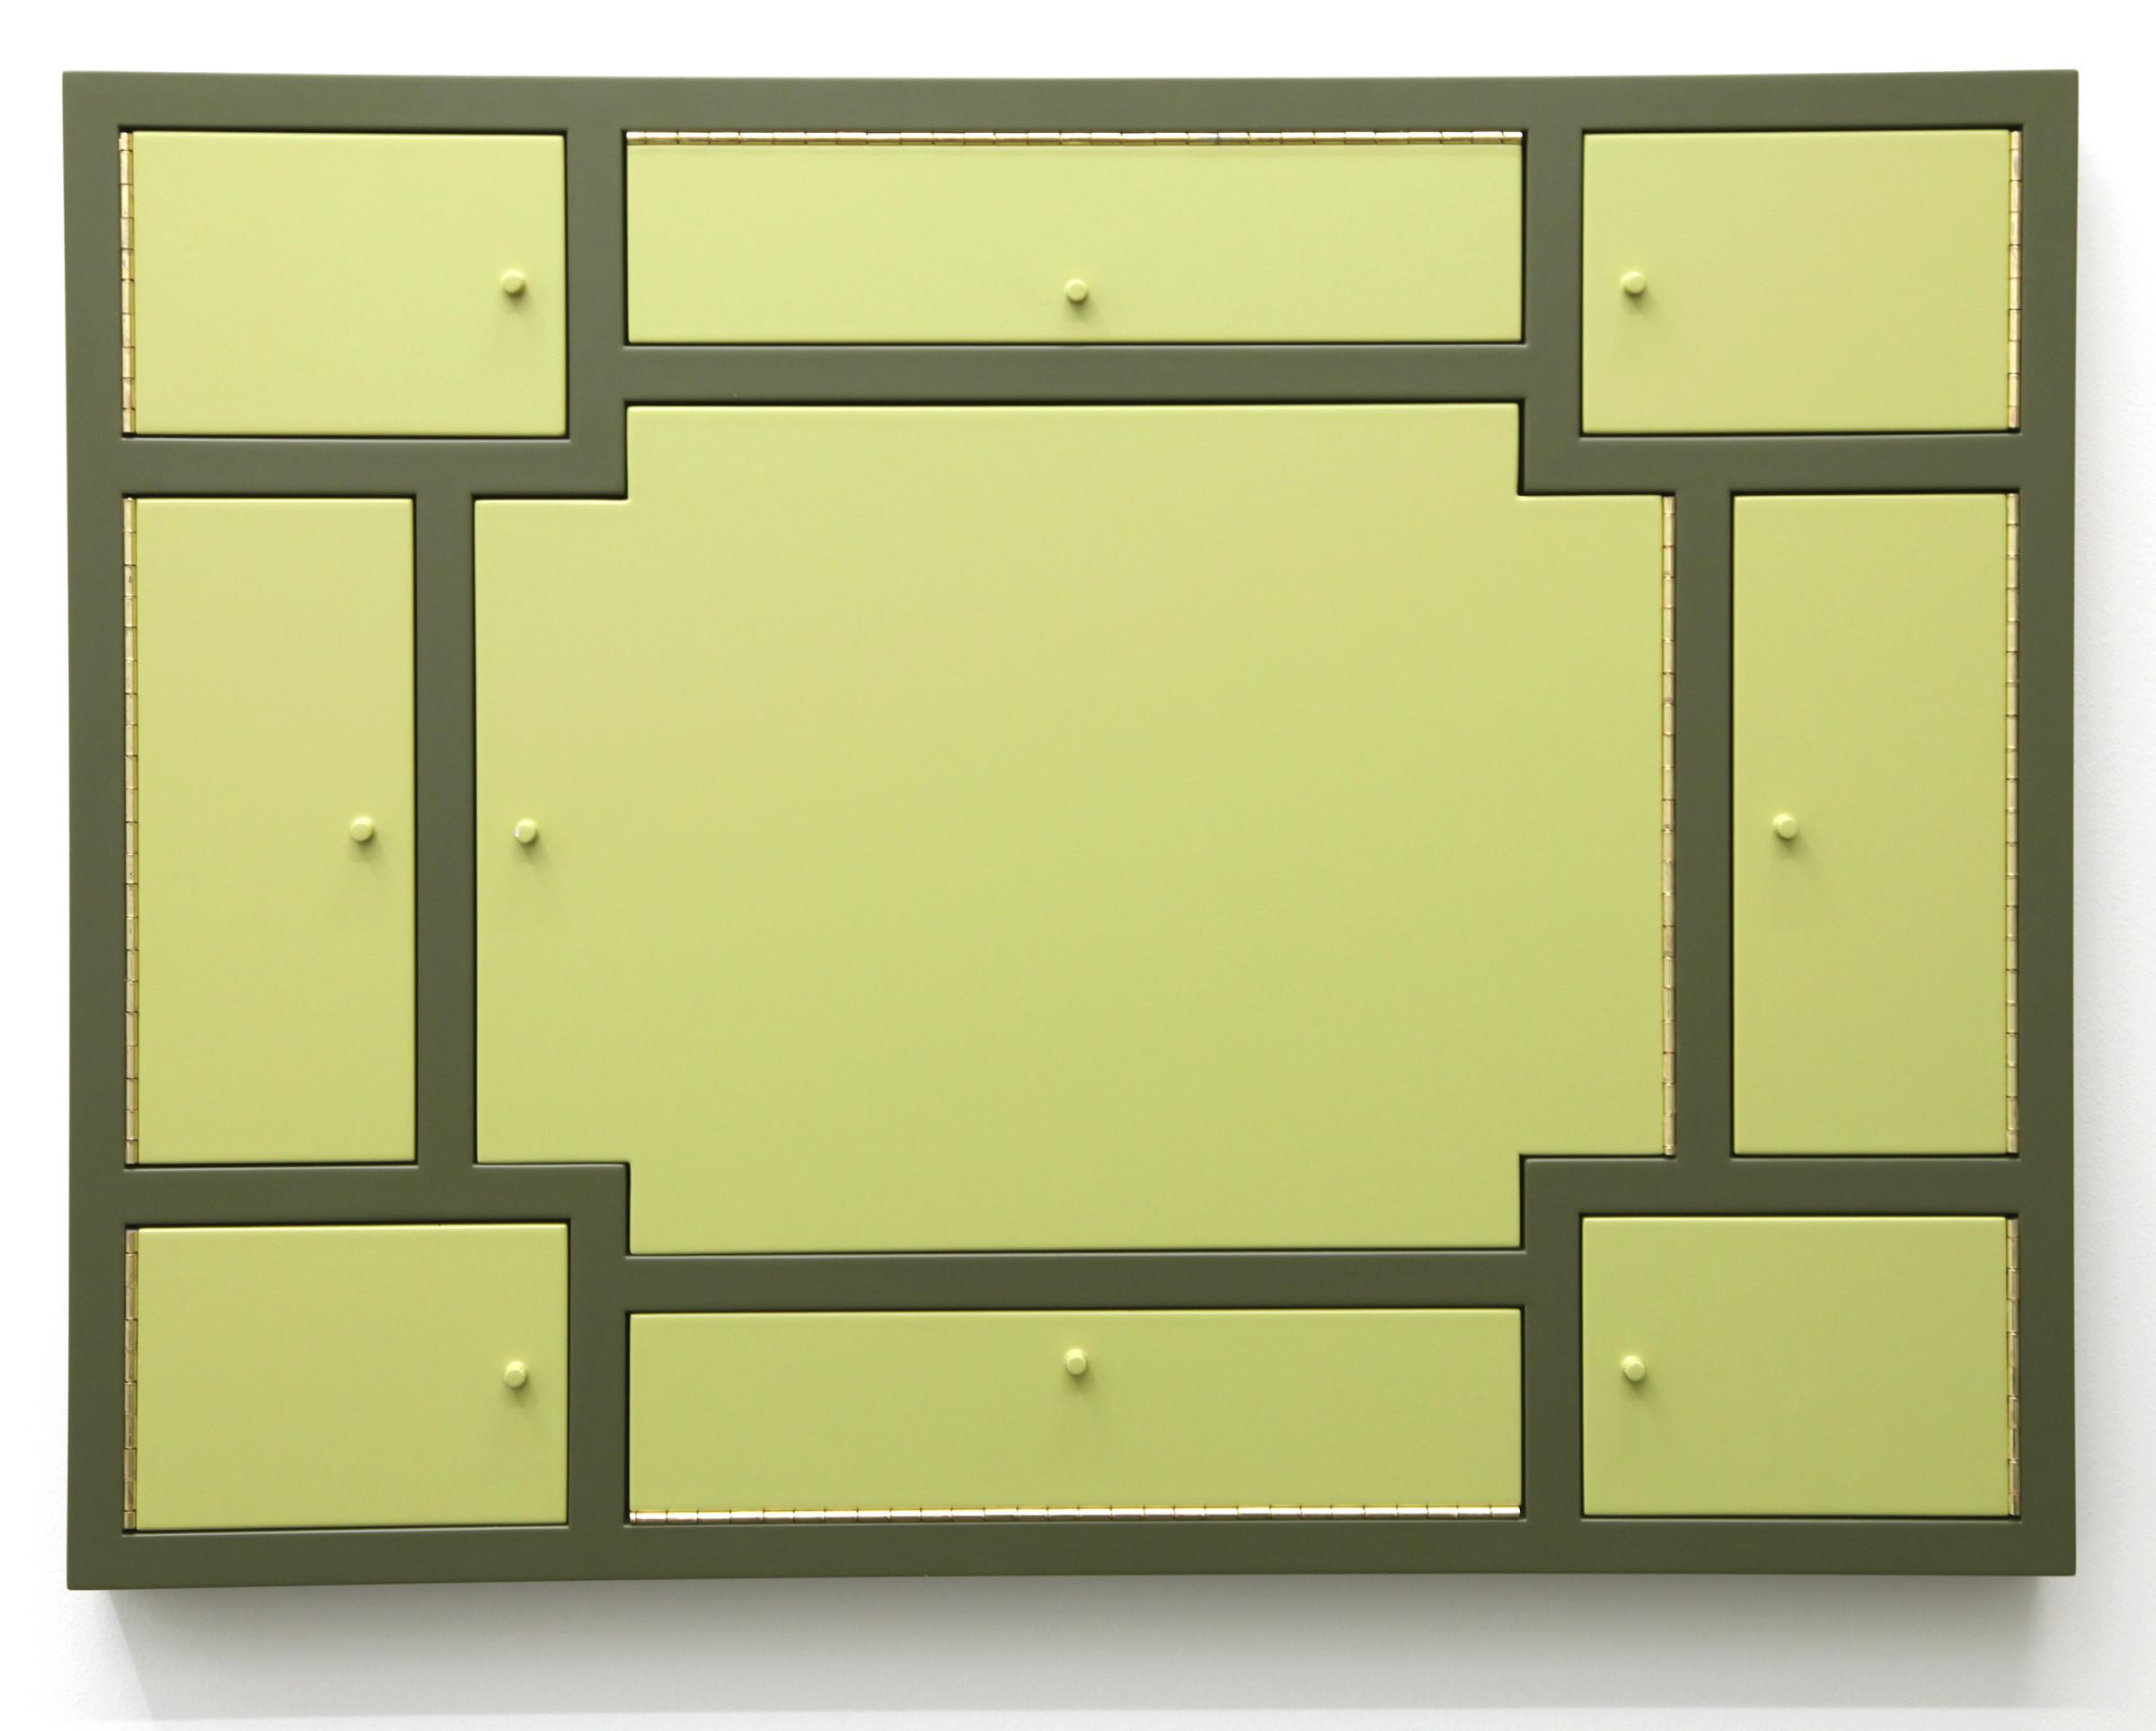 "<span class=""link fancybox-details-link""><a href=""/artists/129-birgir-andresson/works/6194/"">View Detail Page</a></span><div class=""artist""><strong>BIRGIR ANDRÉSSON</strong></div> <div class=""title""><em>Cabinet No. 17</em>, 2000</div> <div class=""medium"">MDF, varnish</div> <div class=""dimensions"">60 x 80 x 6 cm</div>"